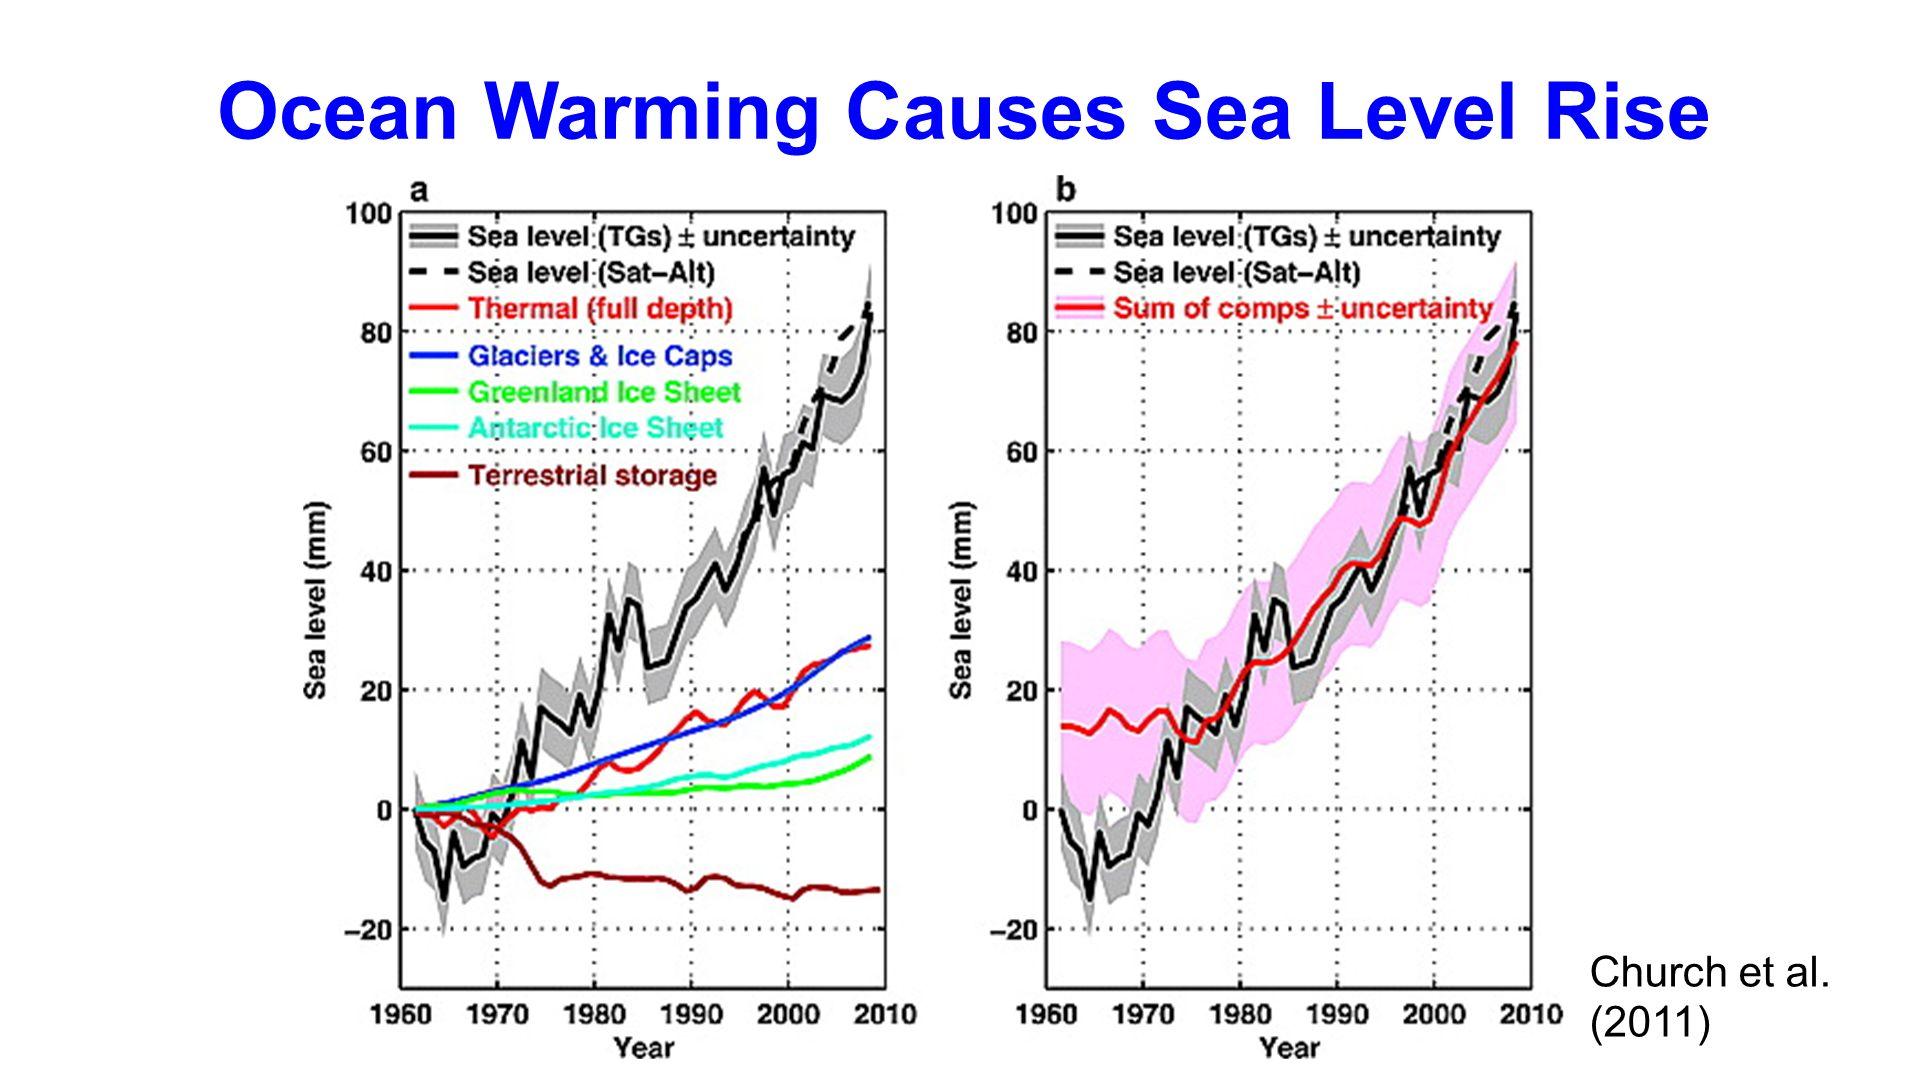 Ocean Warming Causes Sea Level Rise Church et al. (2011)